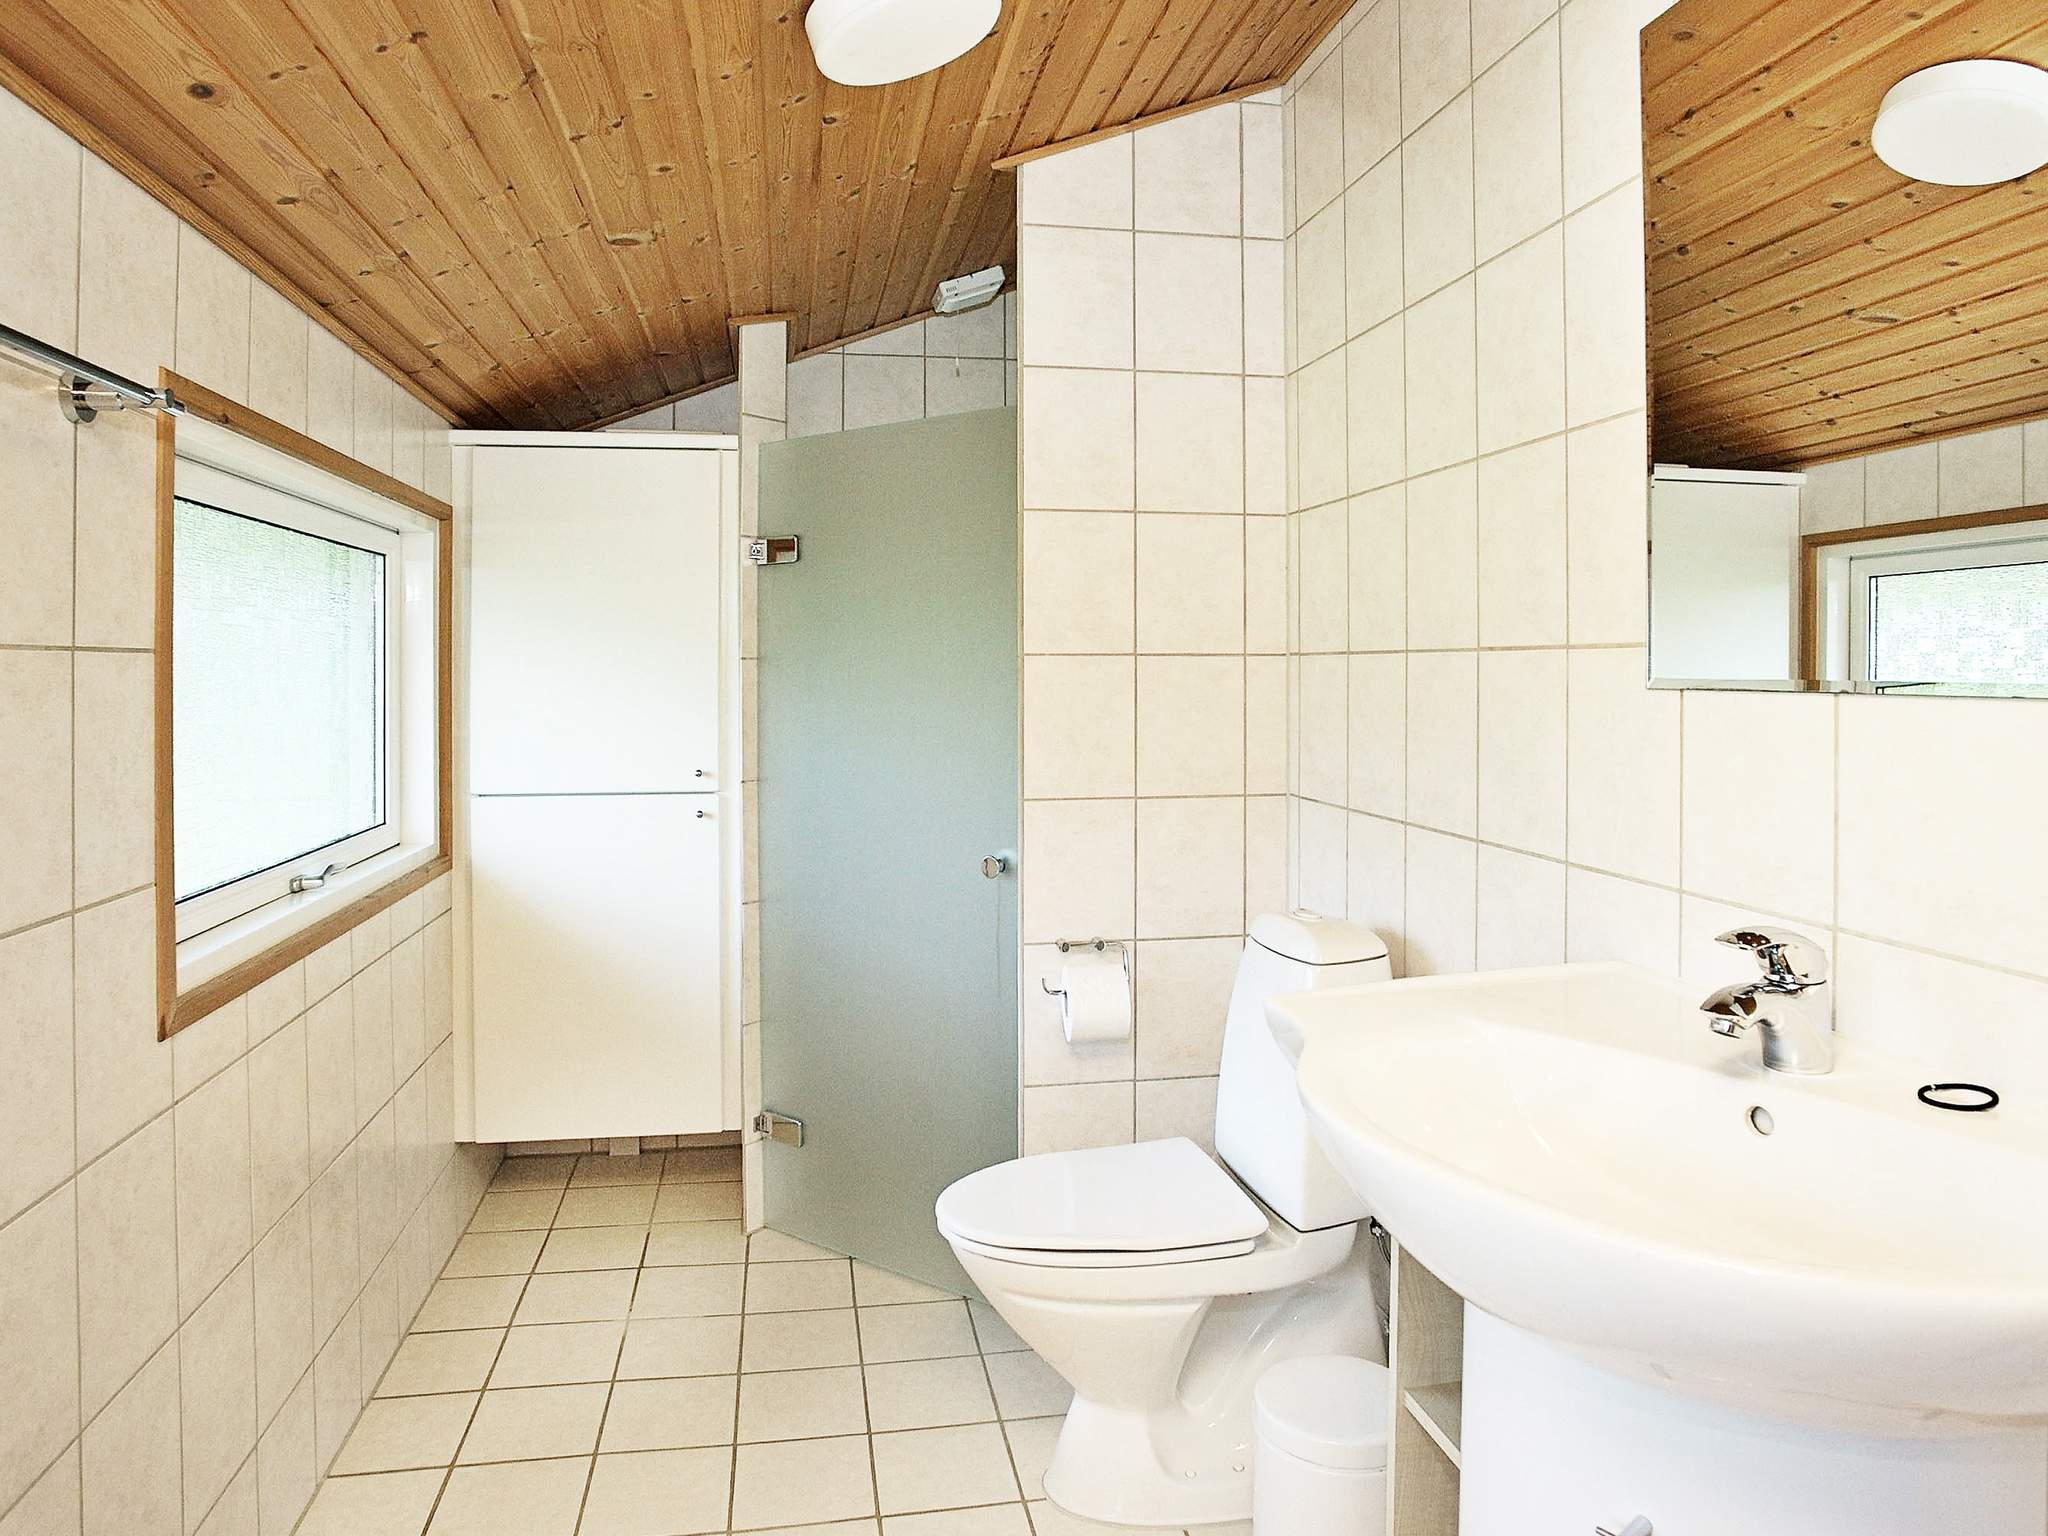 Ferienhaus Grønhøj Strand (89188), Løkken, , Nordwestjütland, Dänemark, Bild 9